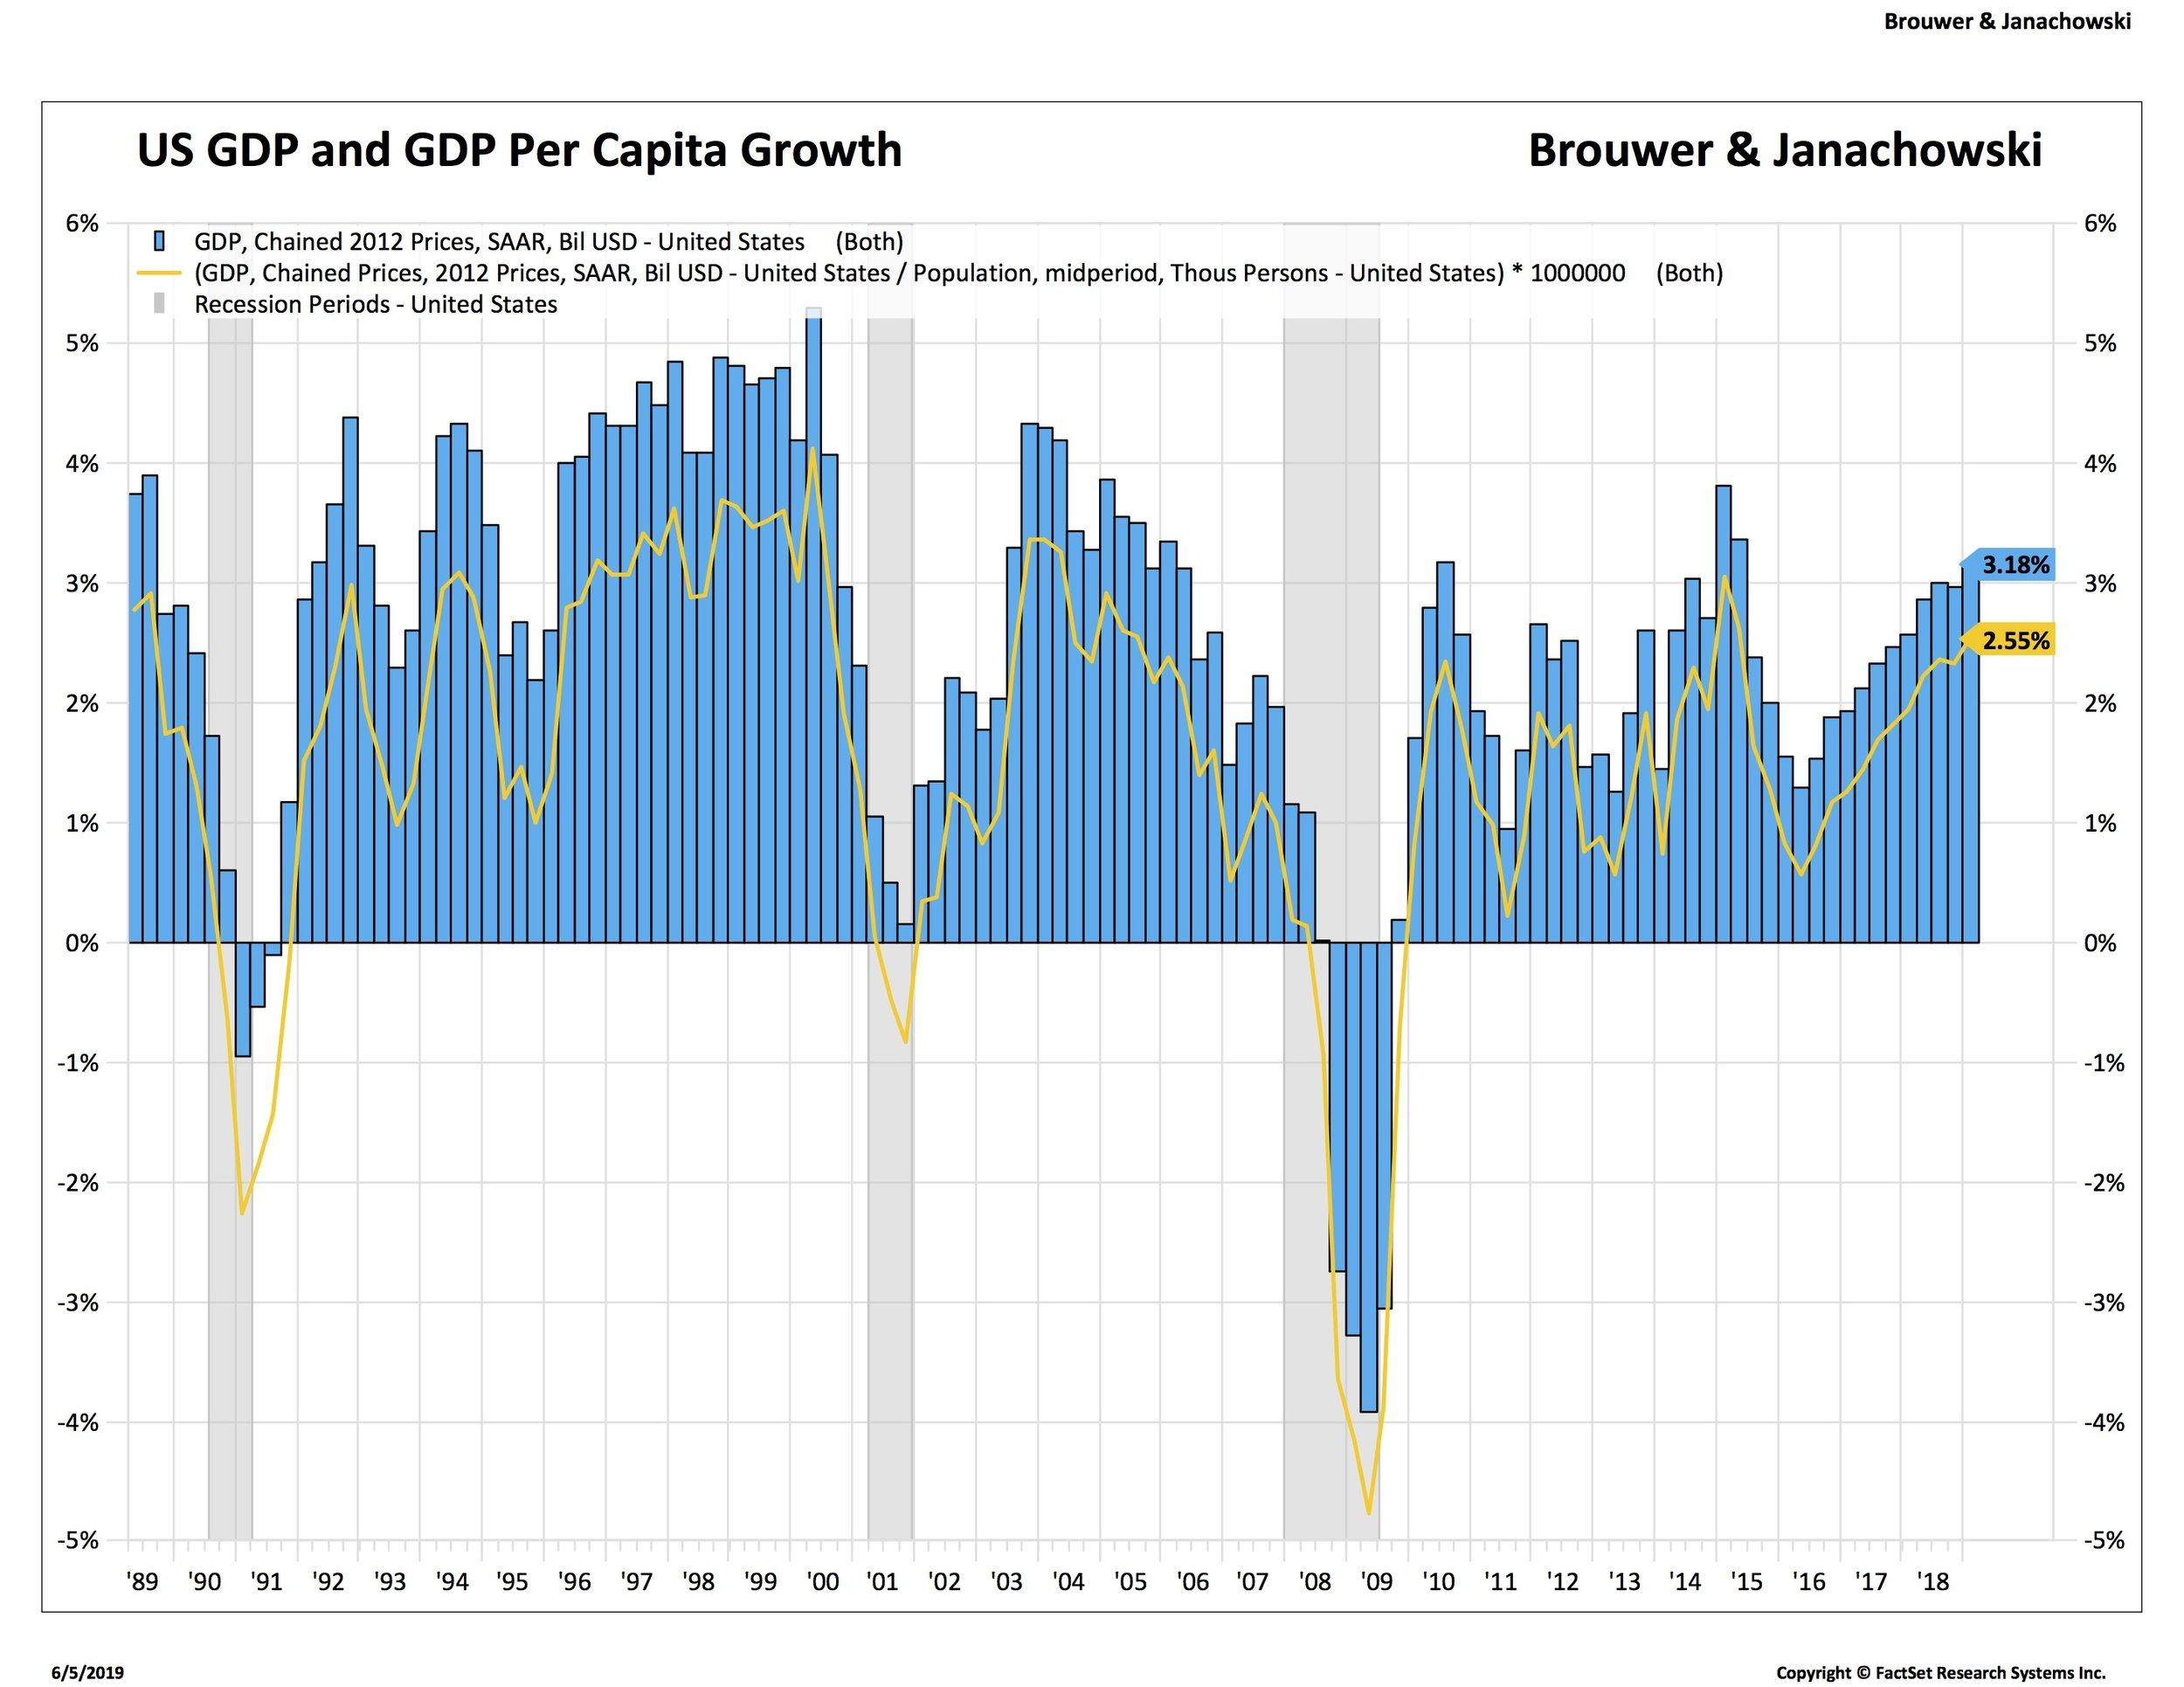 Investment Blog — Brouwer & Janachowski